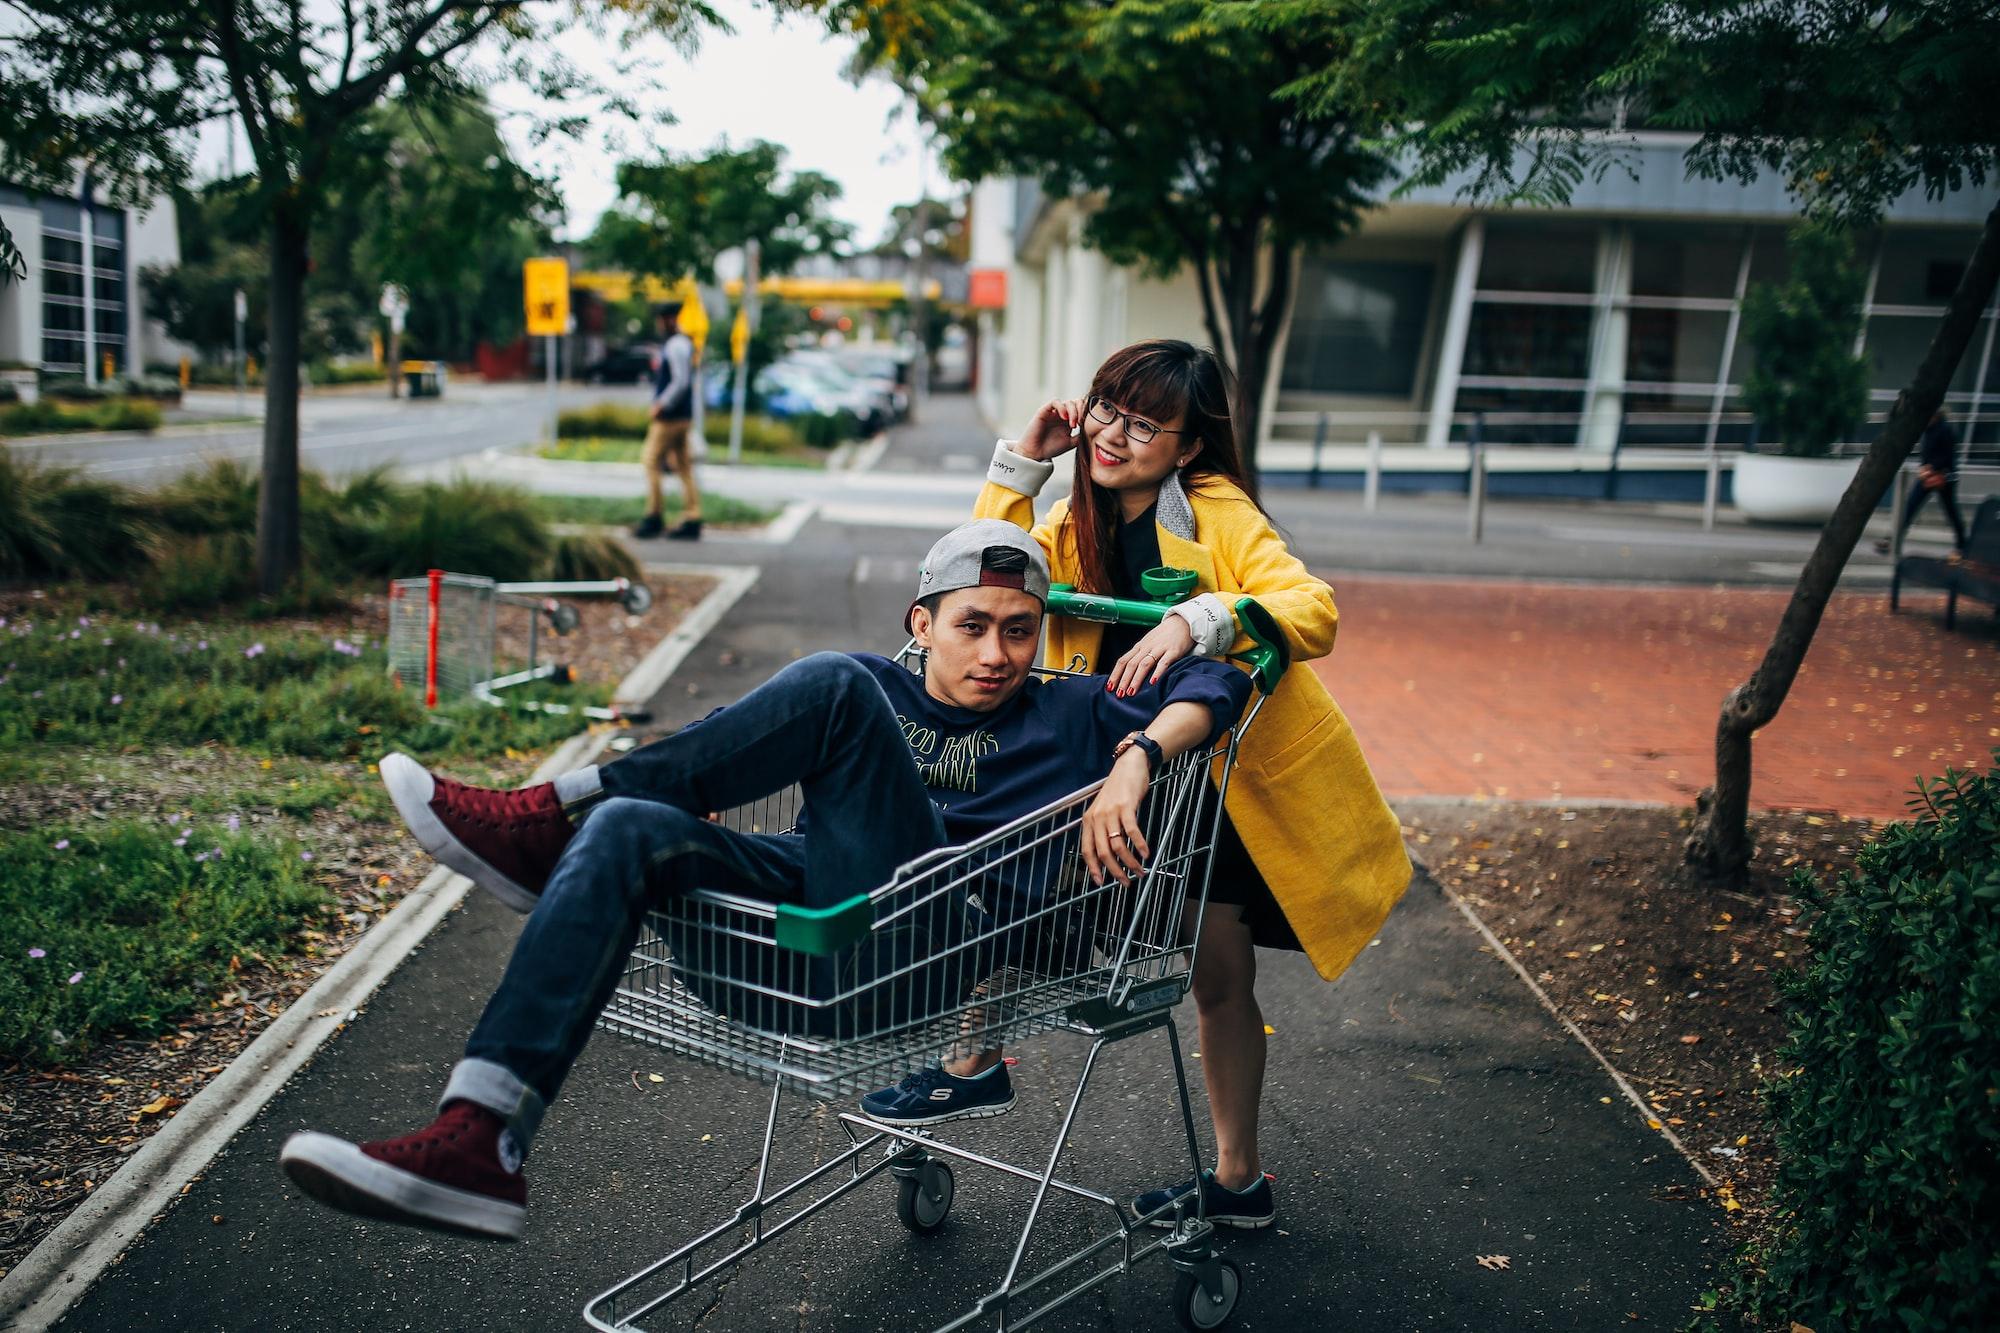 Posing with shopping cart